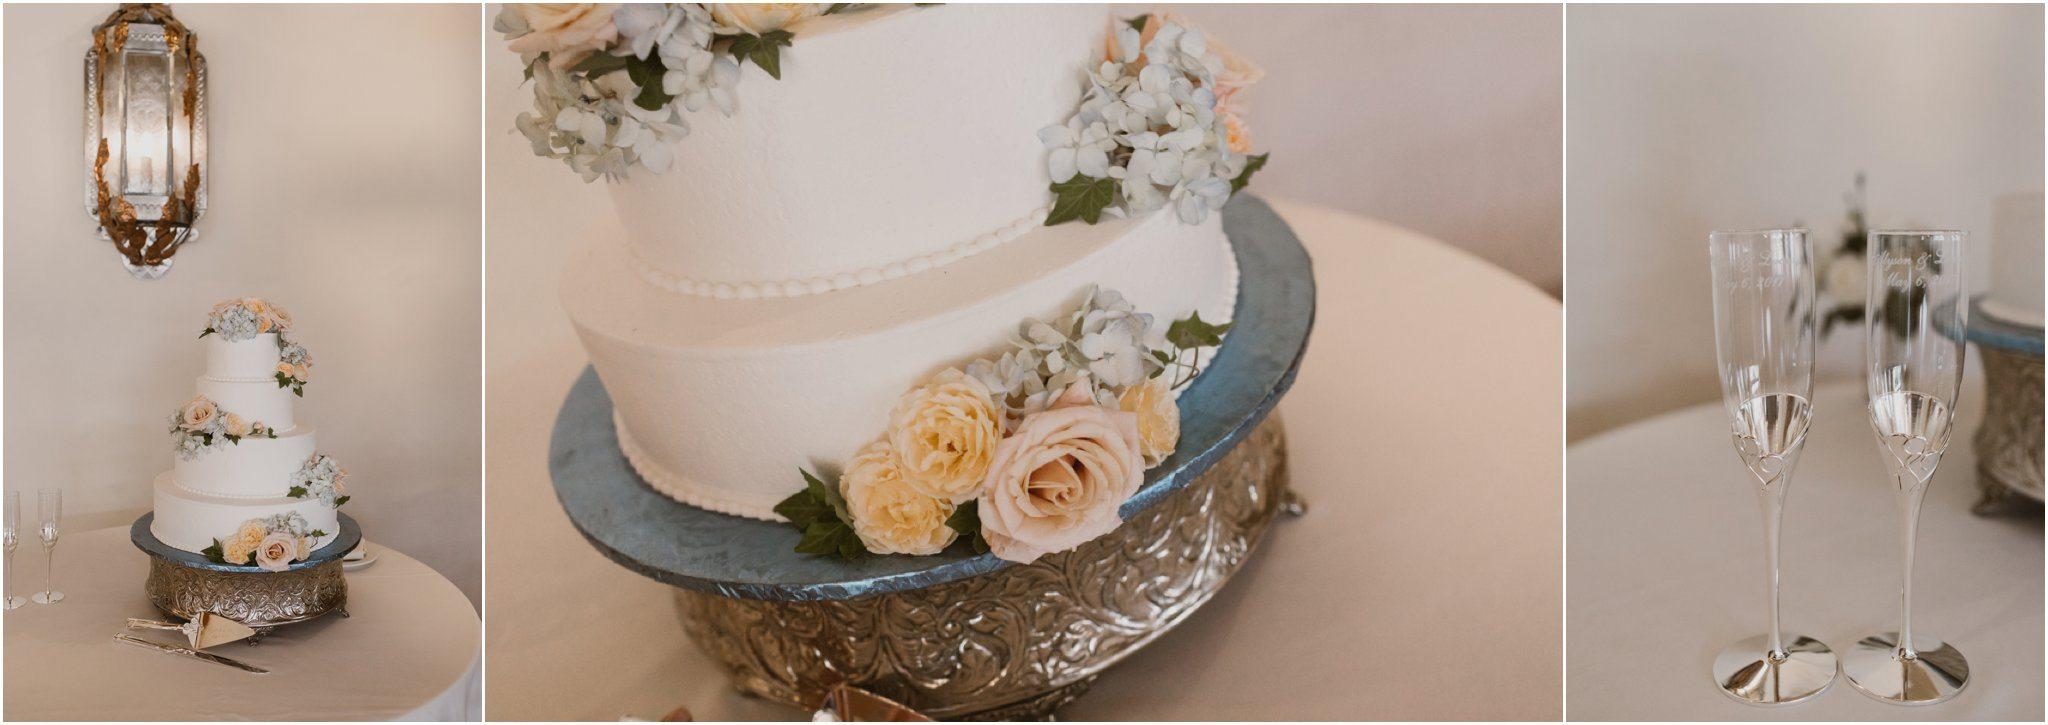 31Blue Rose Photography_ Albuquerque_ Santa Fe_ New Mexico wedding photographers